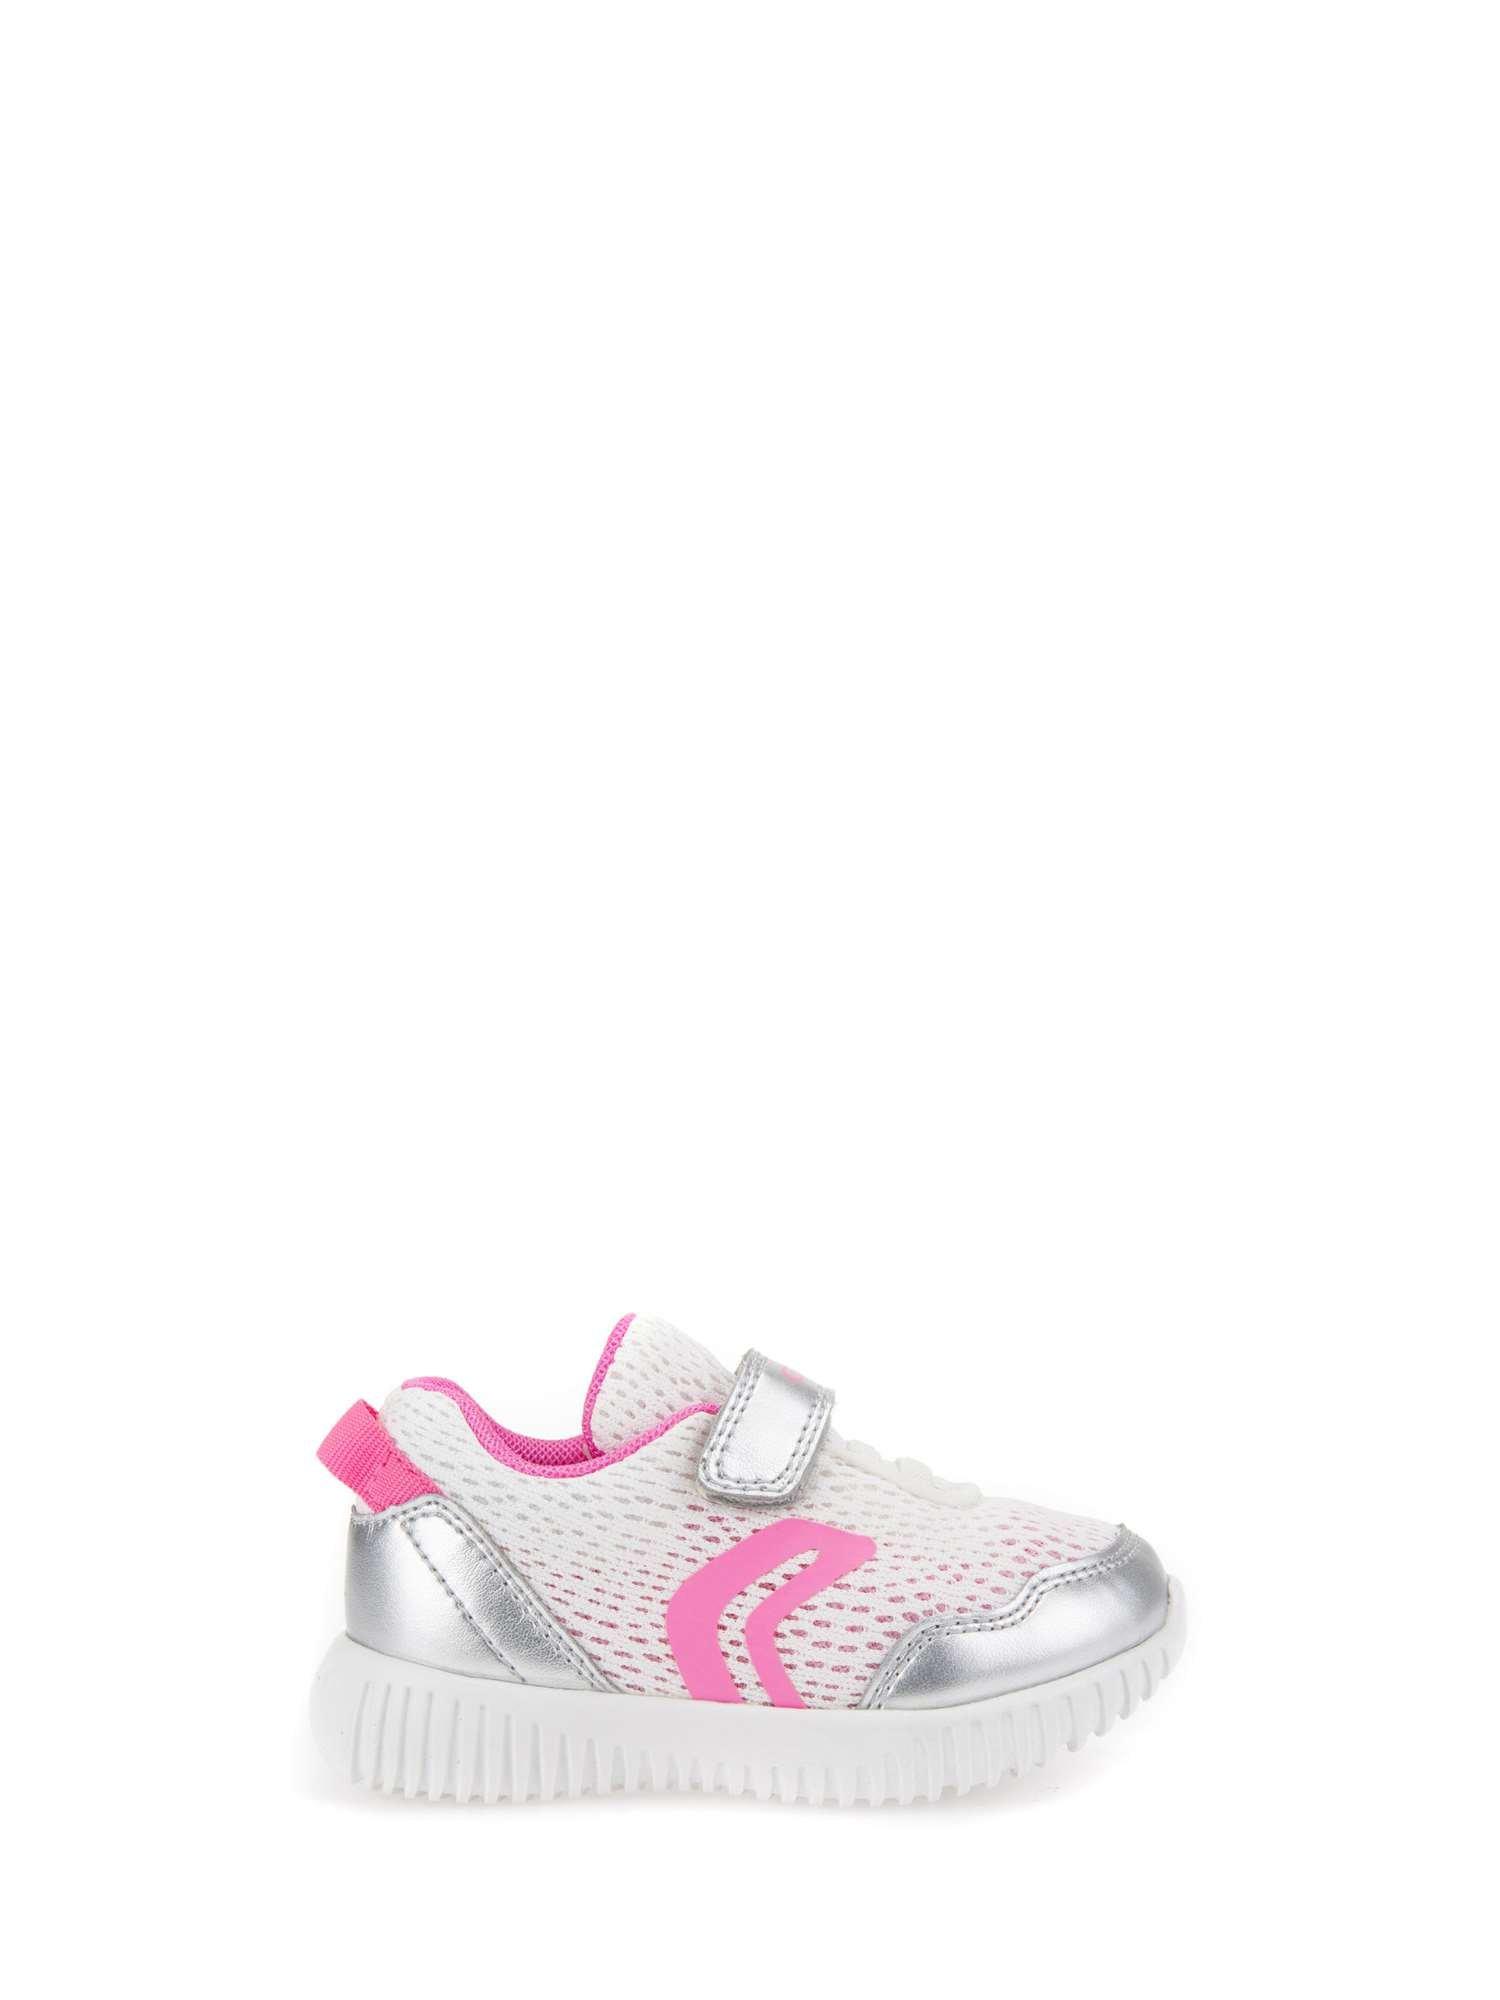 Geox B Waviness Girl B, Zapatillas para Bebés